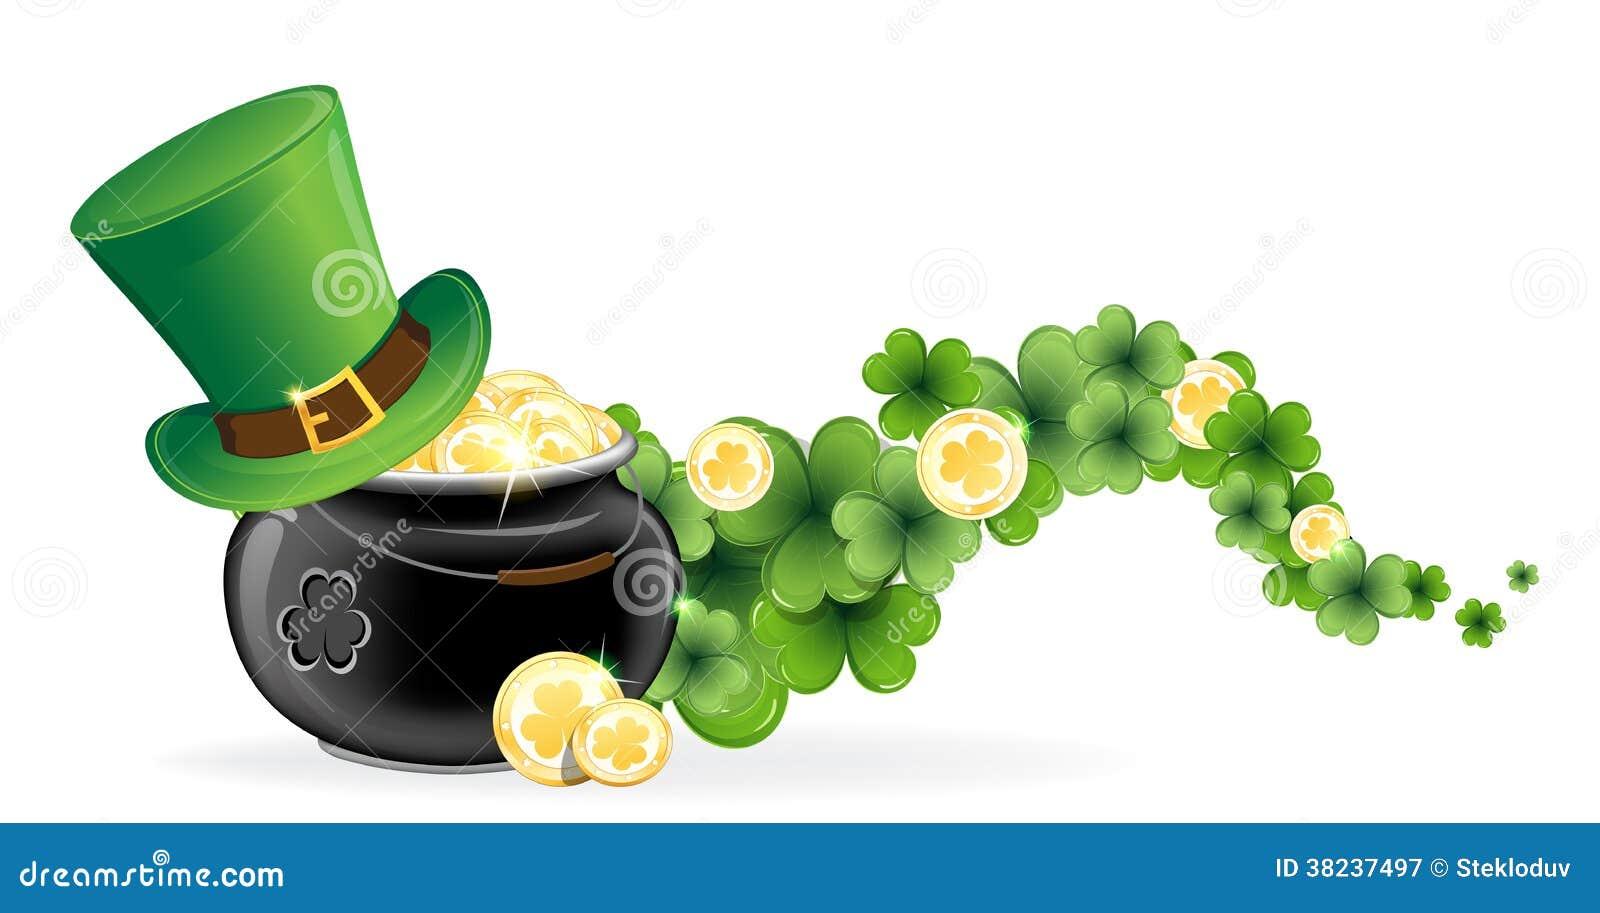 Leprechaun And Pot Of Gold Cartoon Vector | CartoonDealer ...